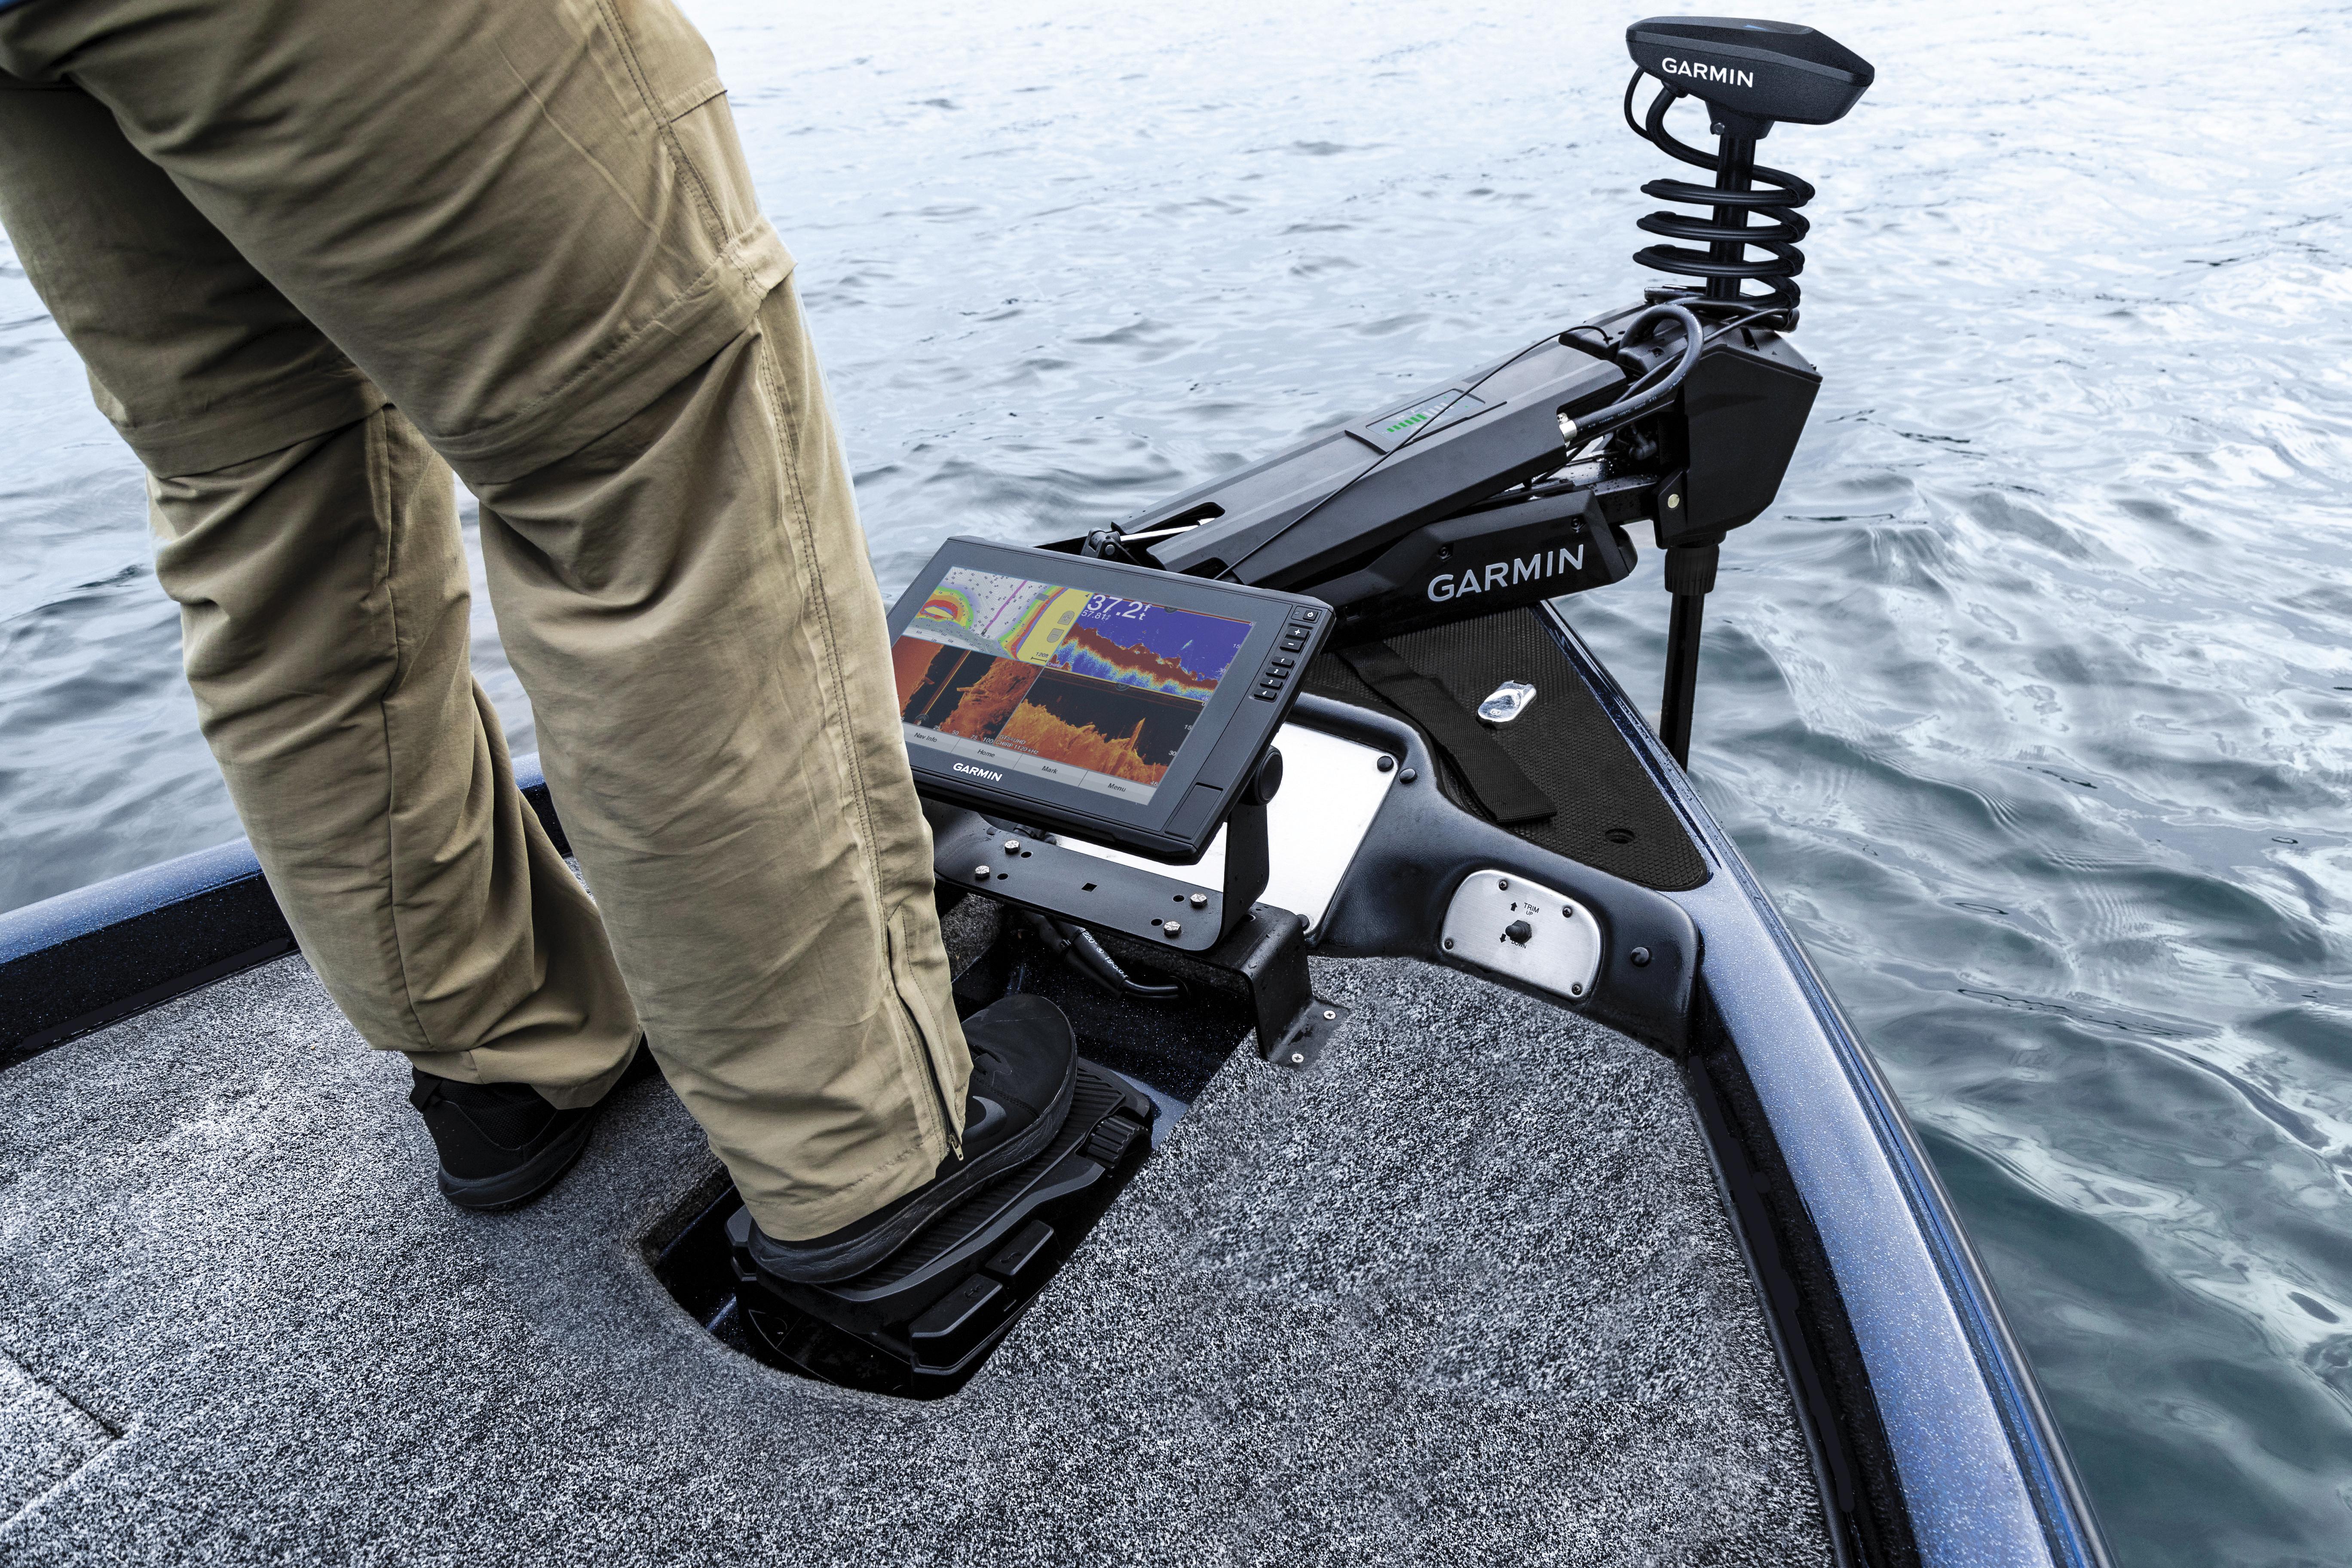 Garmin® enters the freshwater trolling motor market with